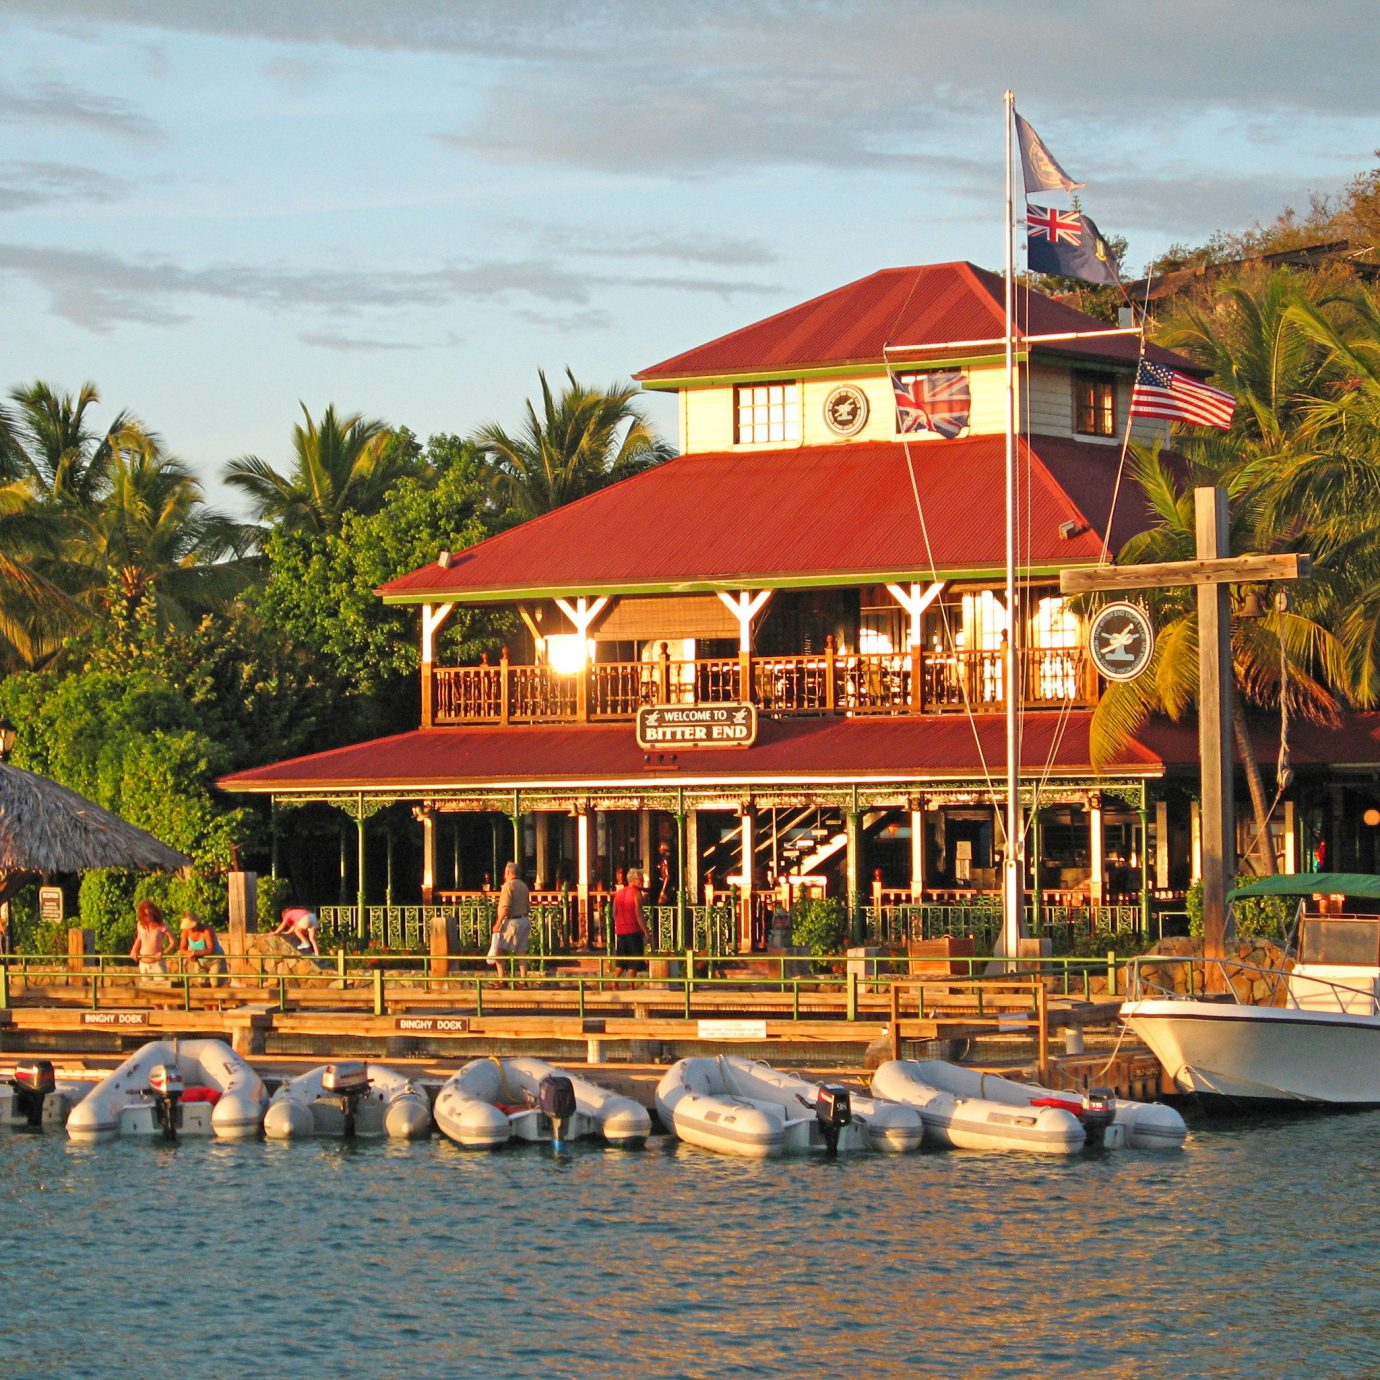 Exterior Tropical Waterfront tree water sky Boat Resort amusement park vehicle Sea boating restaurant